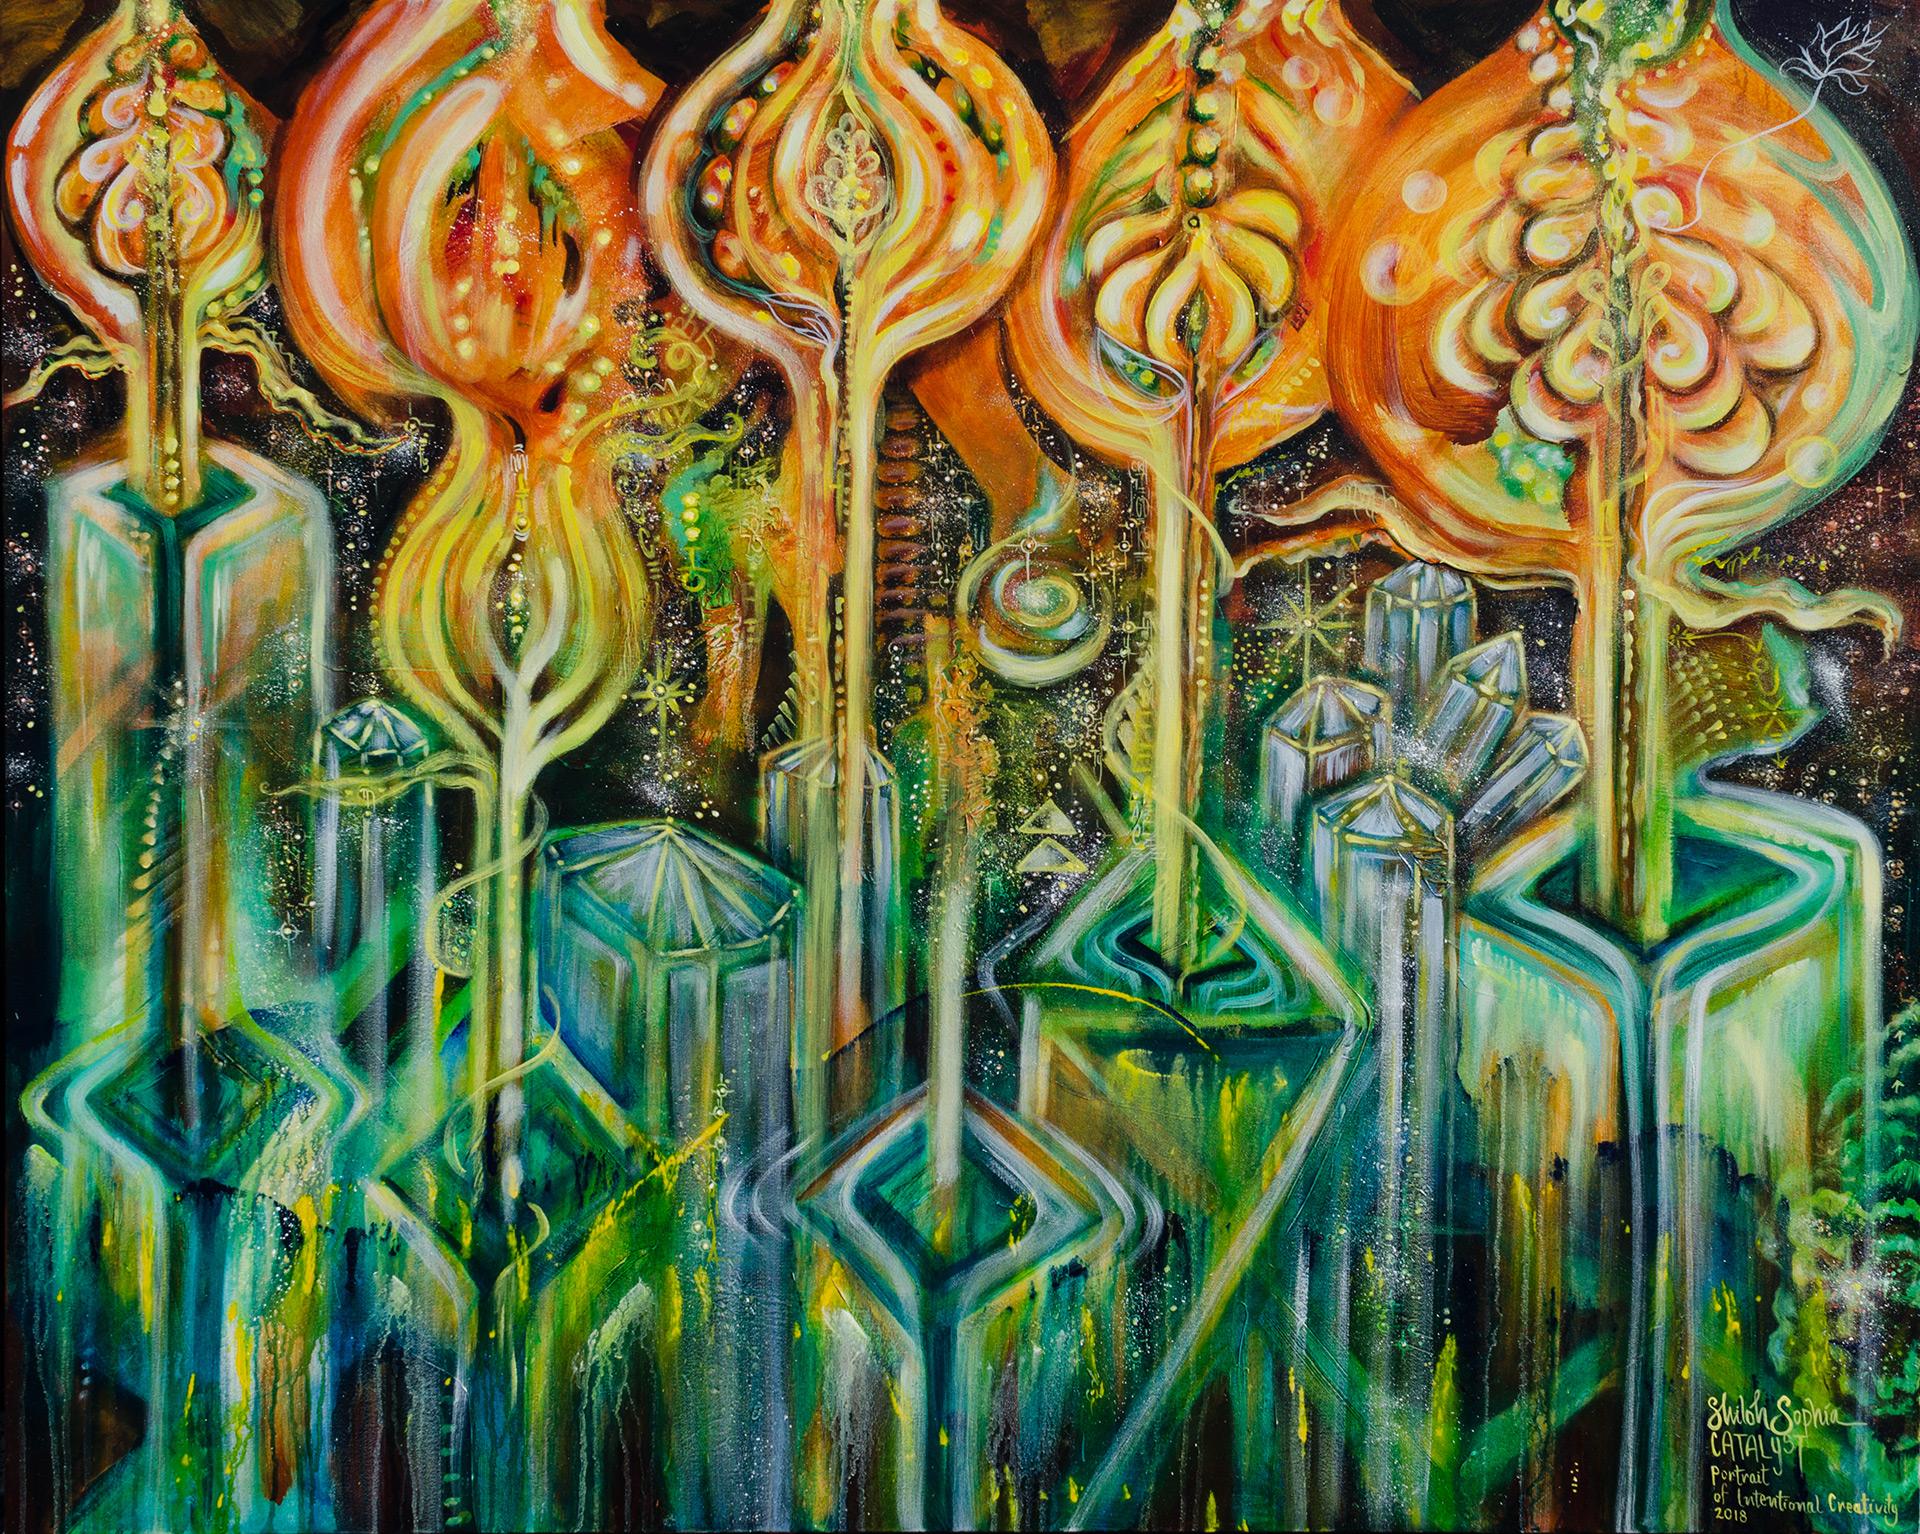 shiloh sophia catalyst painting